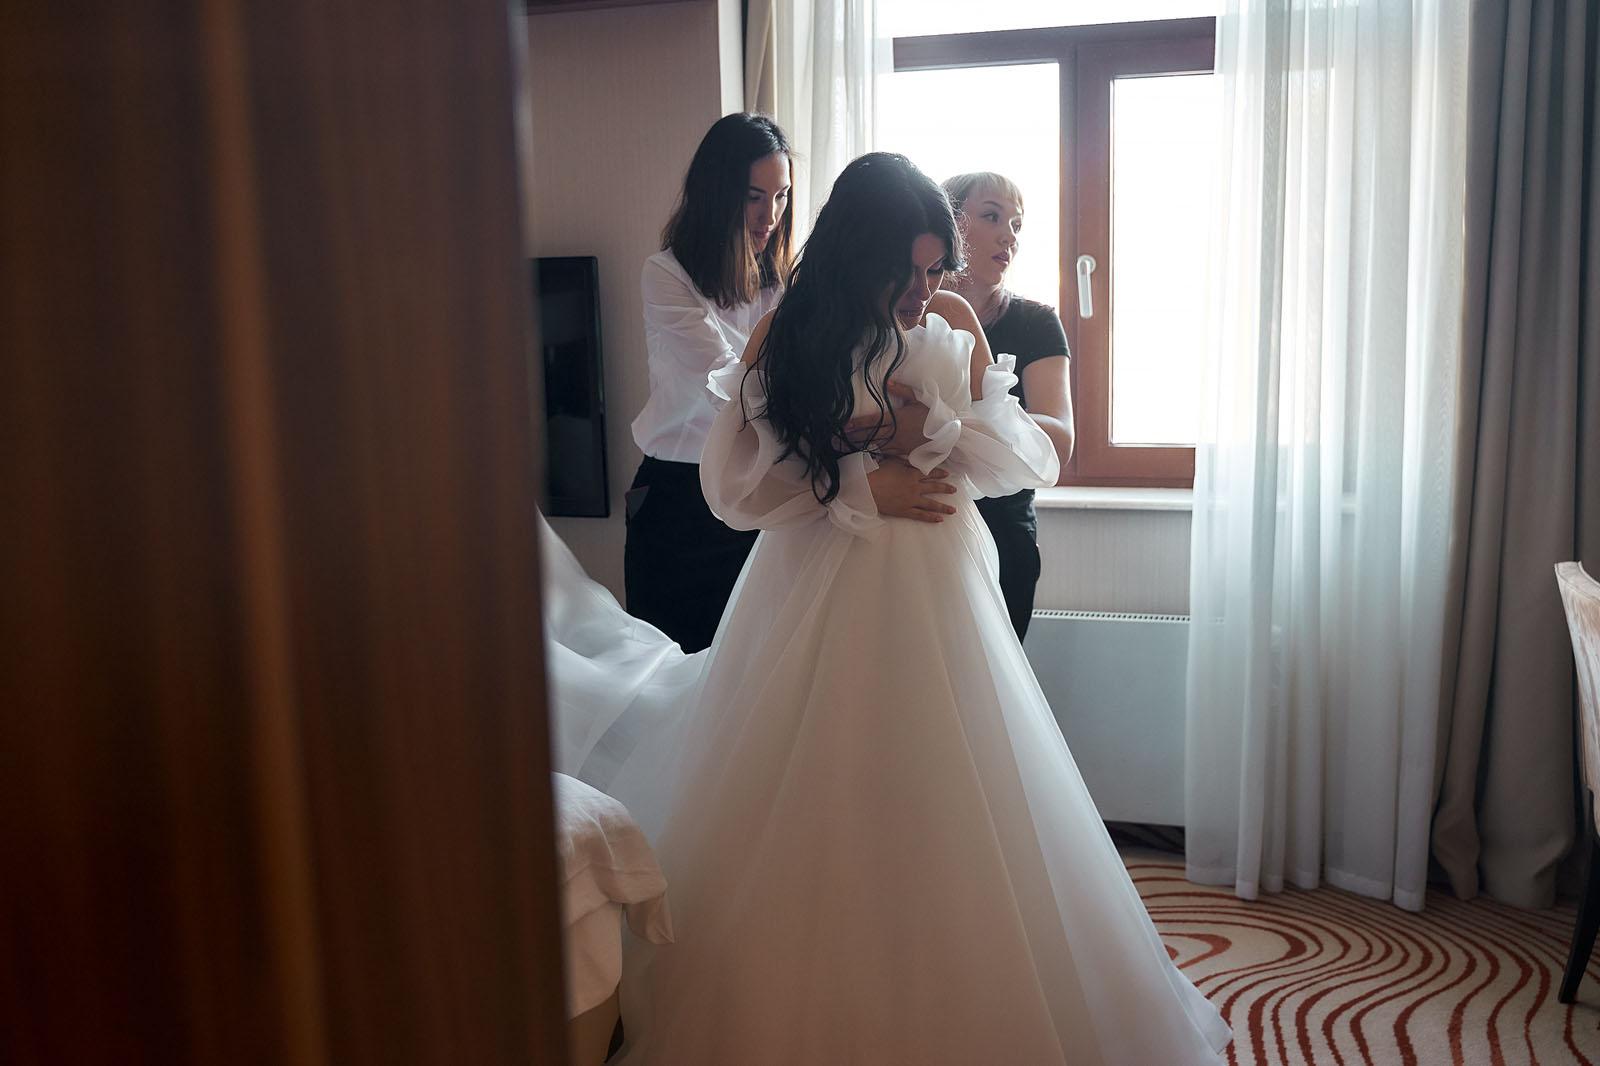 wedding@bekarev2021-04-10-08-51-35.jpg